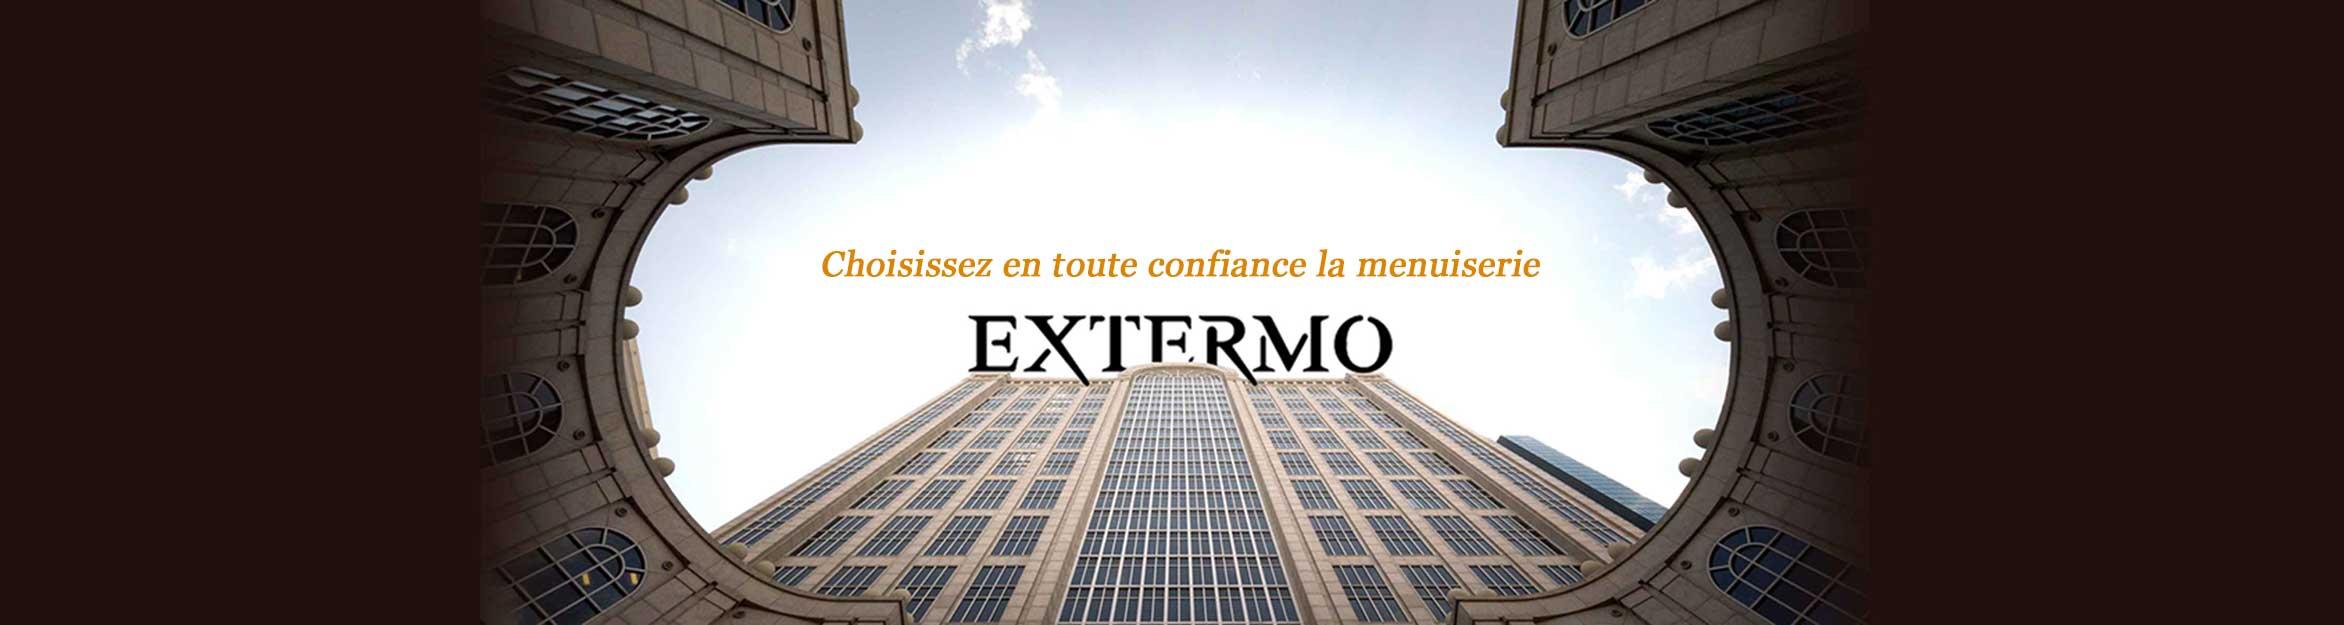 extermo fr